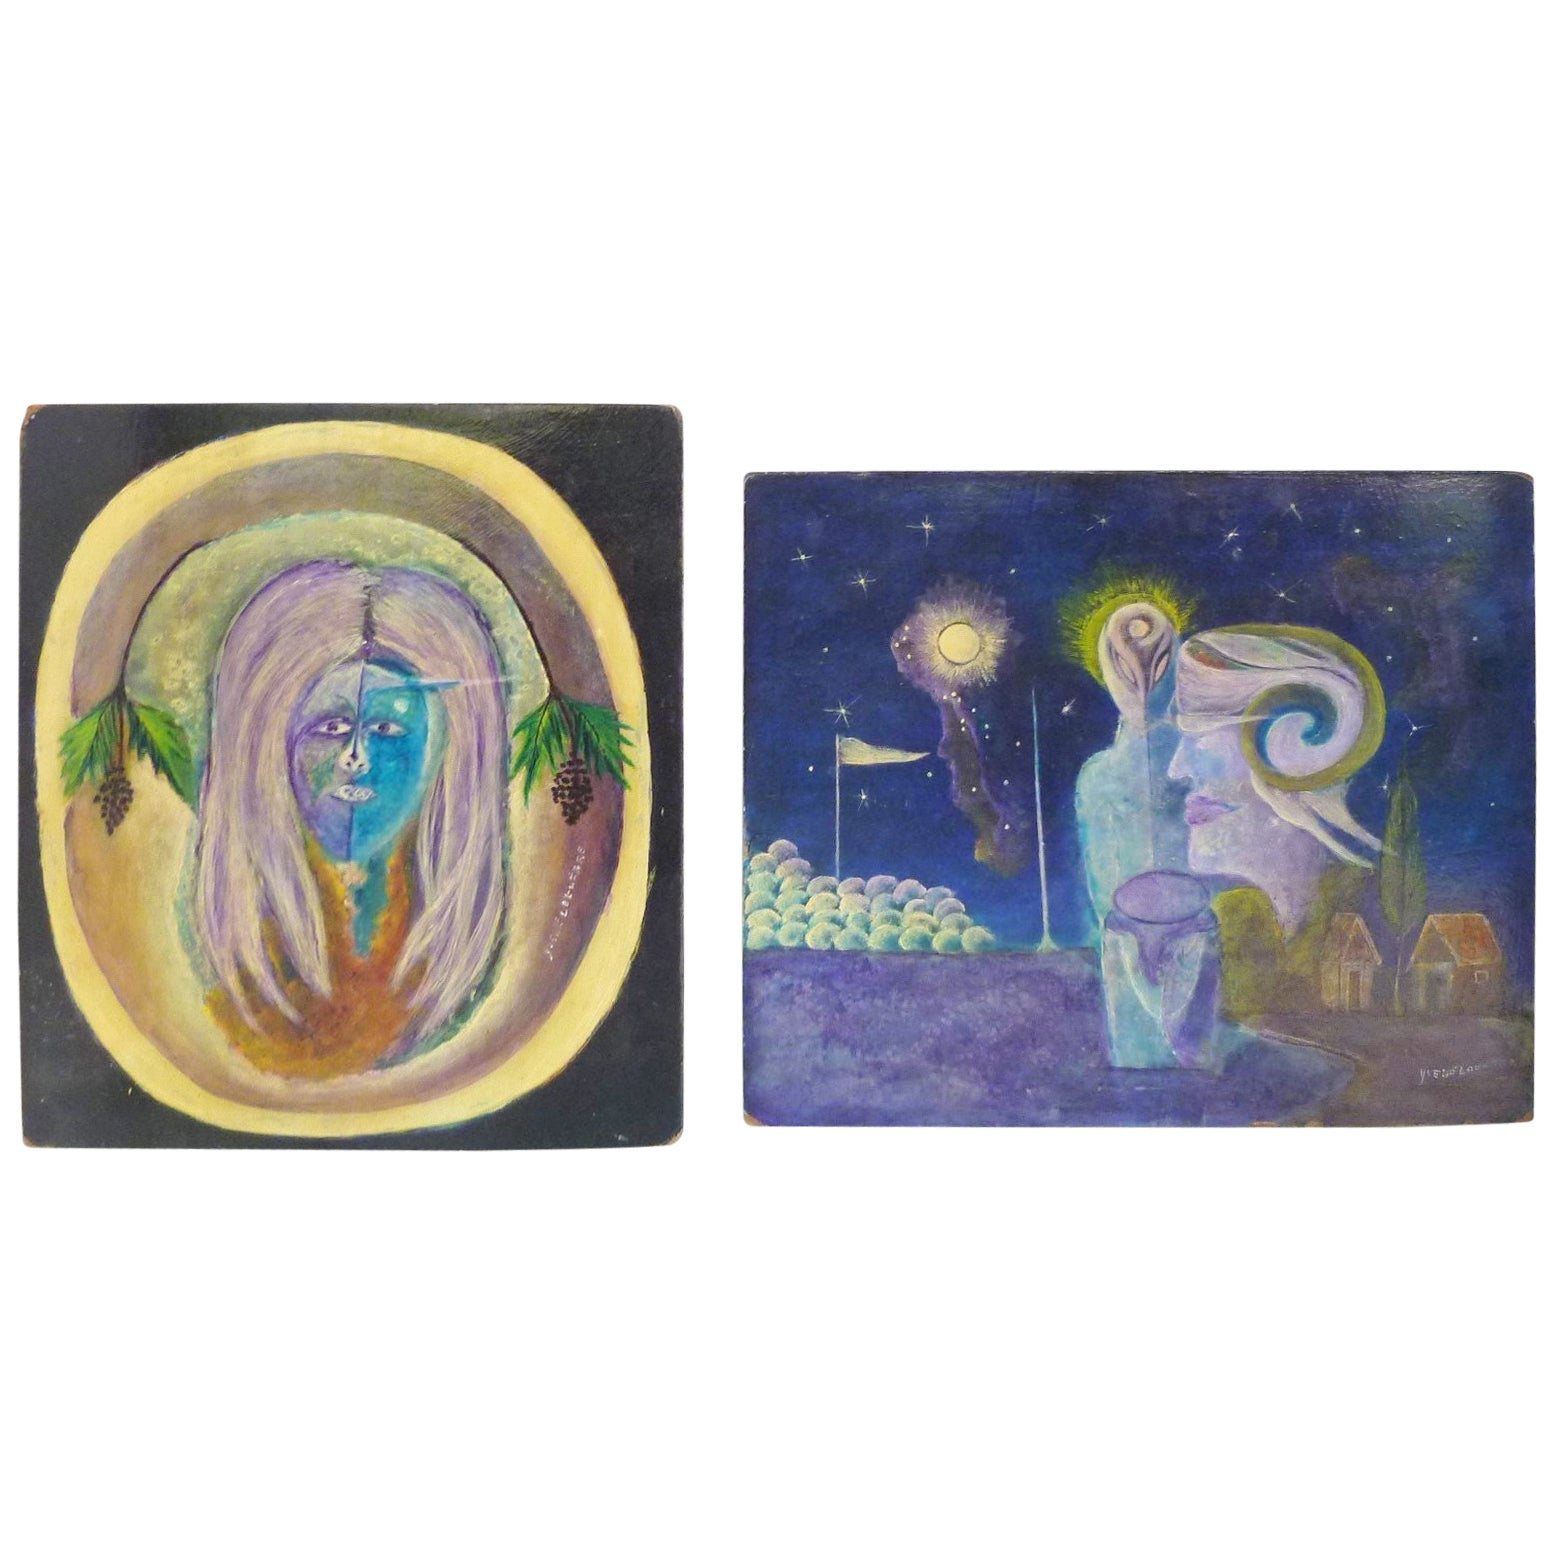 Pair Modern Haitian Oil on Board Surrealism Paintings by Ivette LaGuerre, 1950s